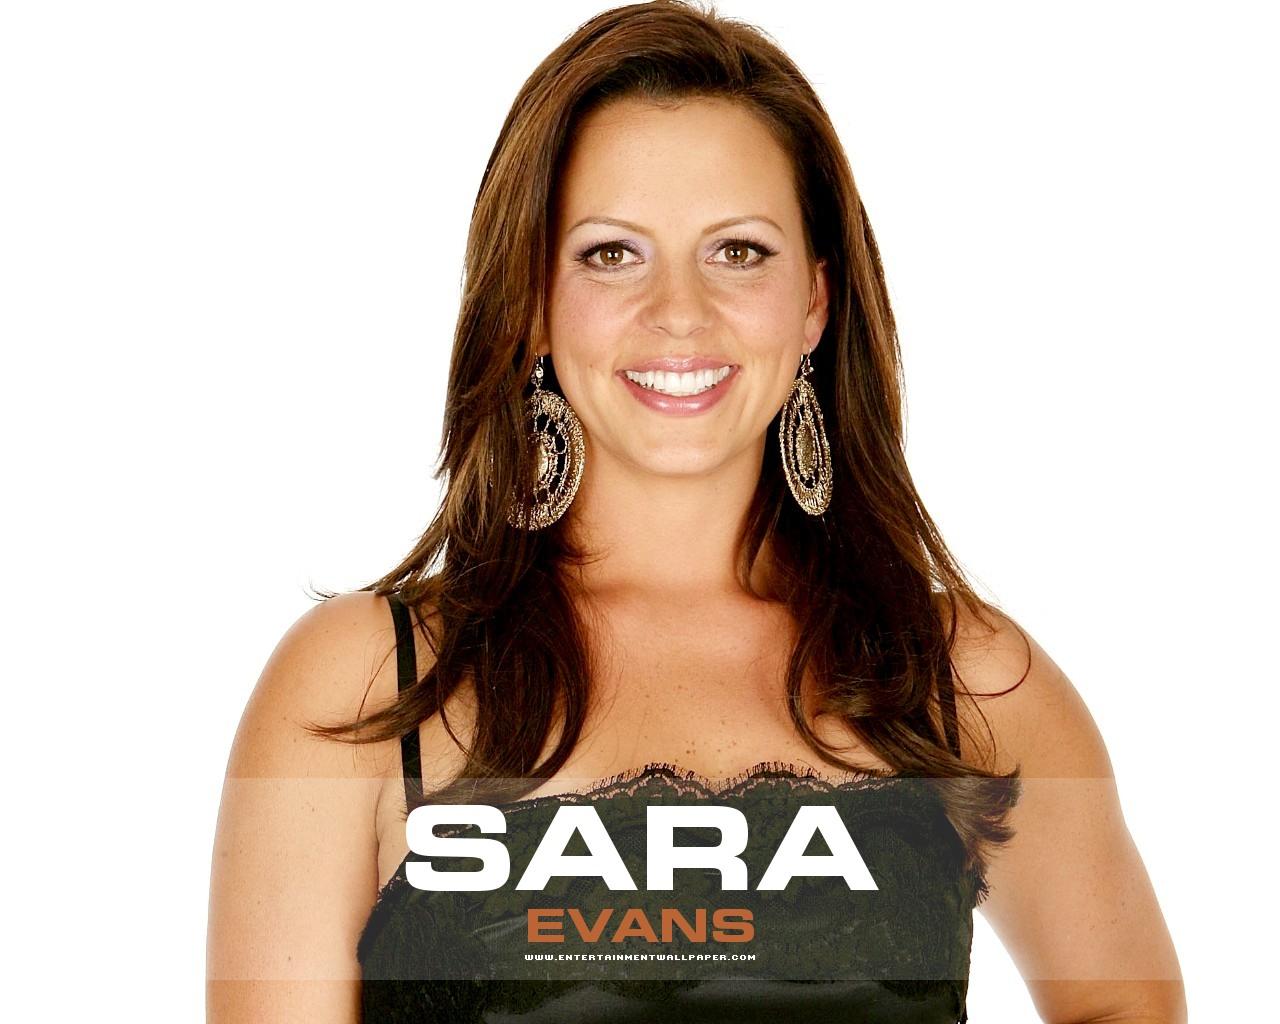 Sara Evans With Wide Button